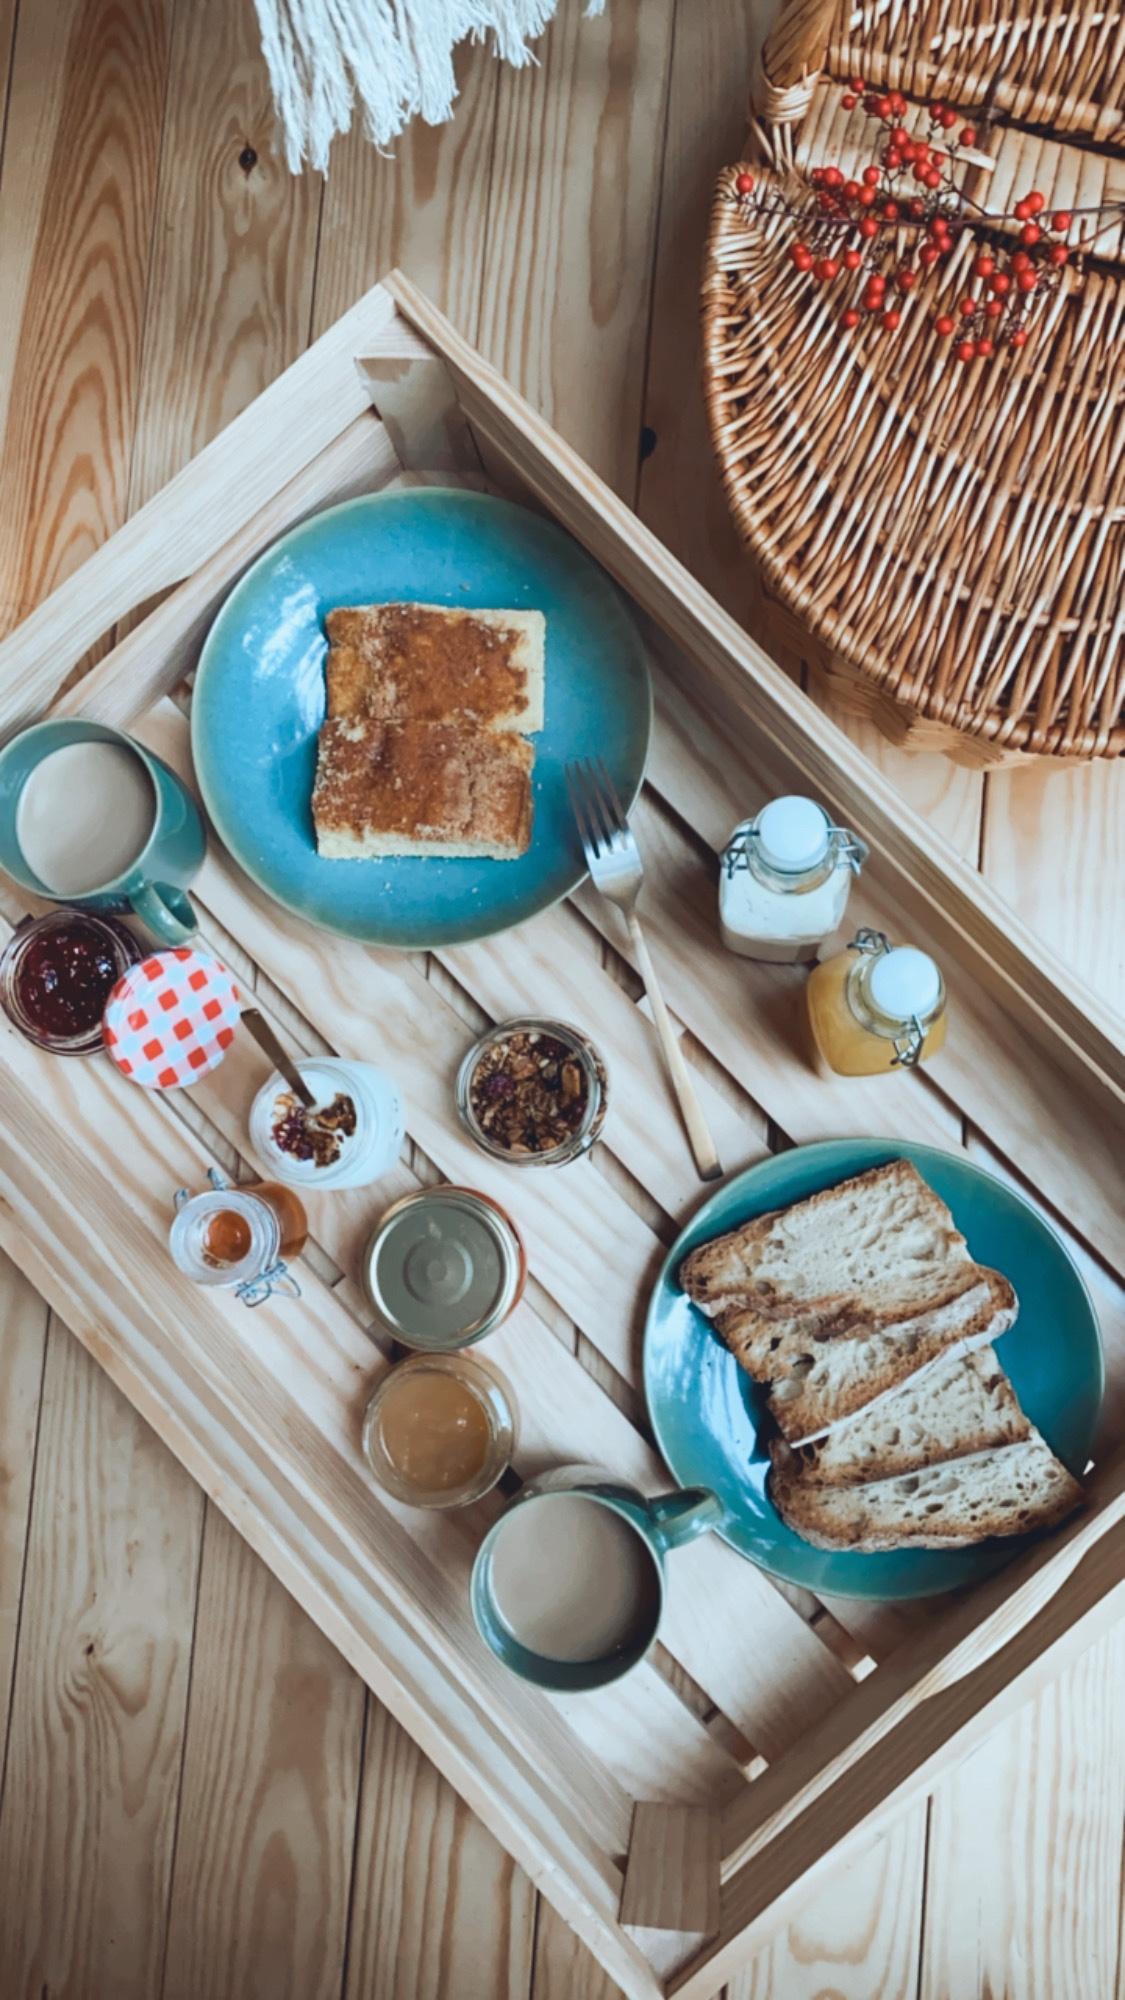 Desayuno casero en Vila sen Vento